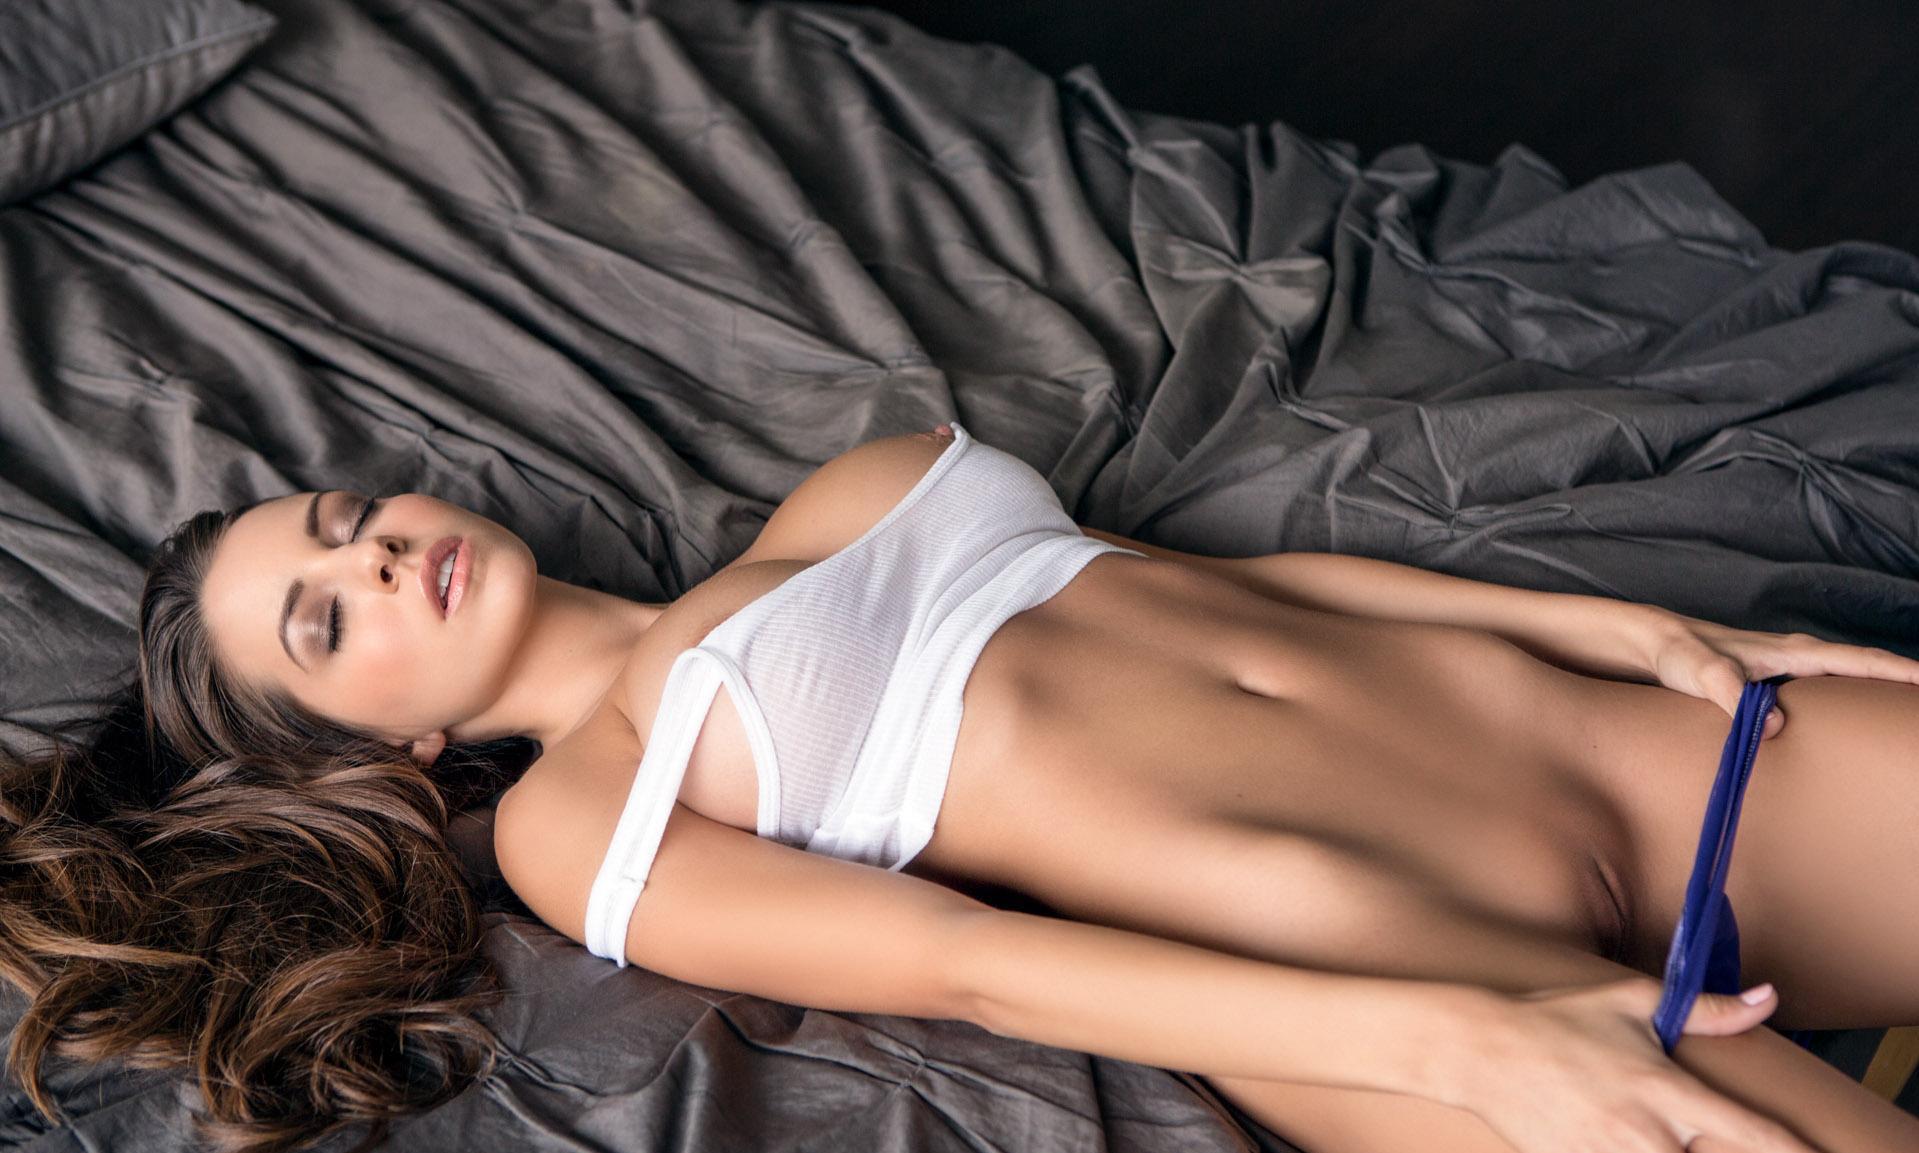 High maintenance babe naked, very very hot sex fuck